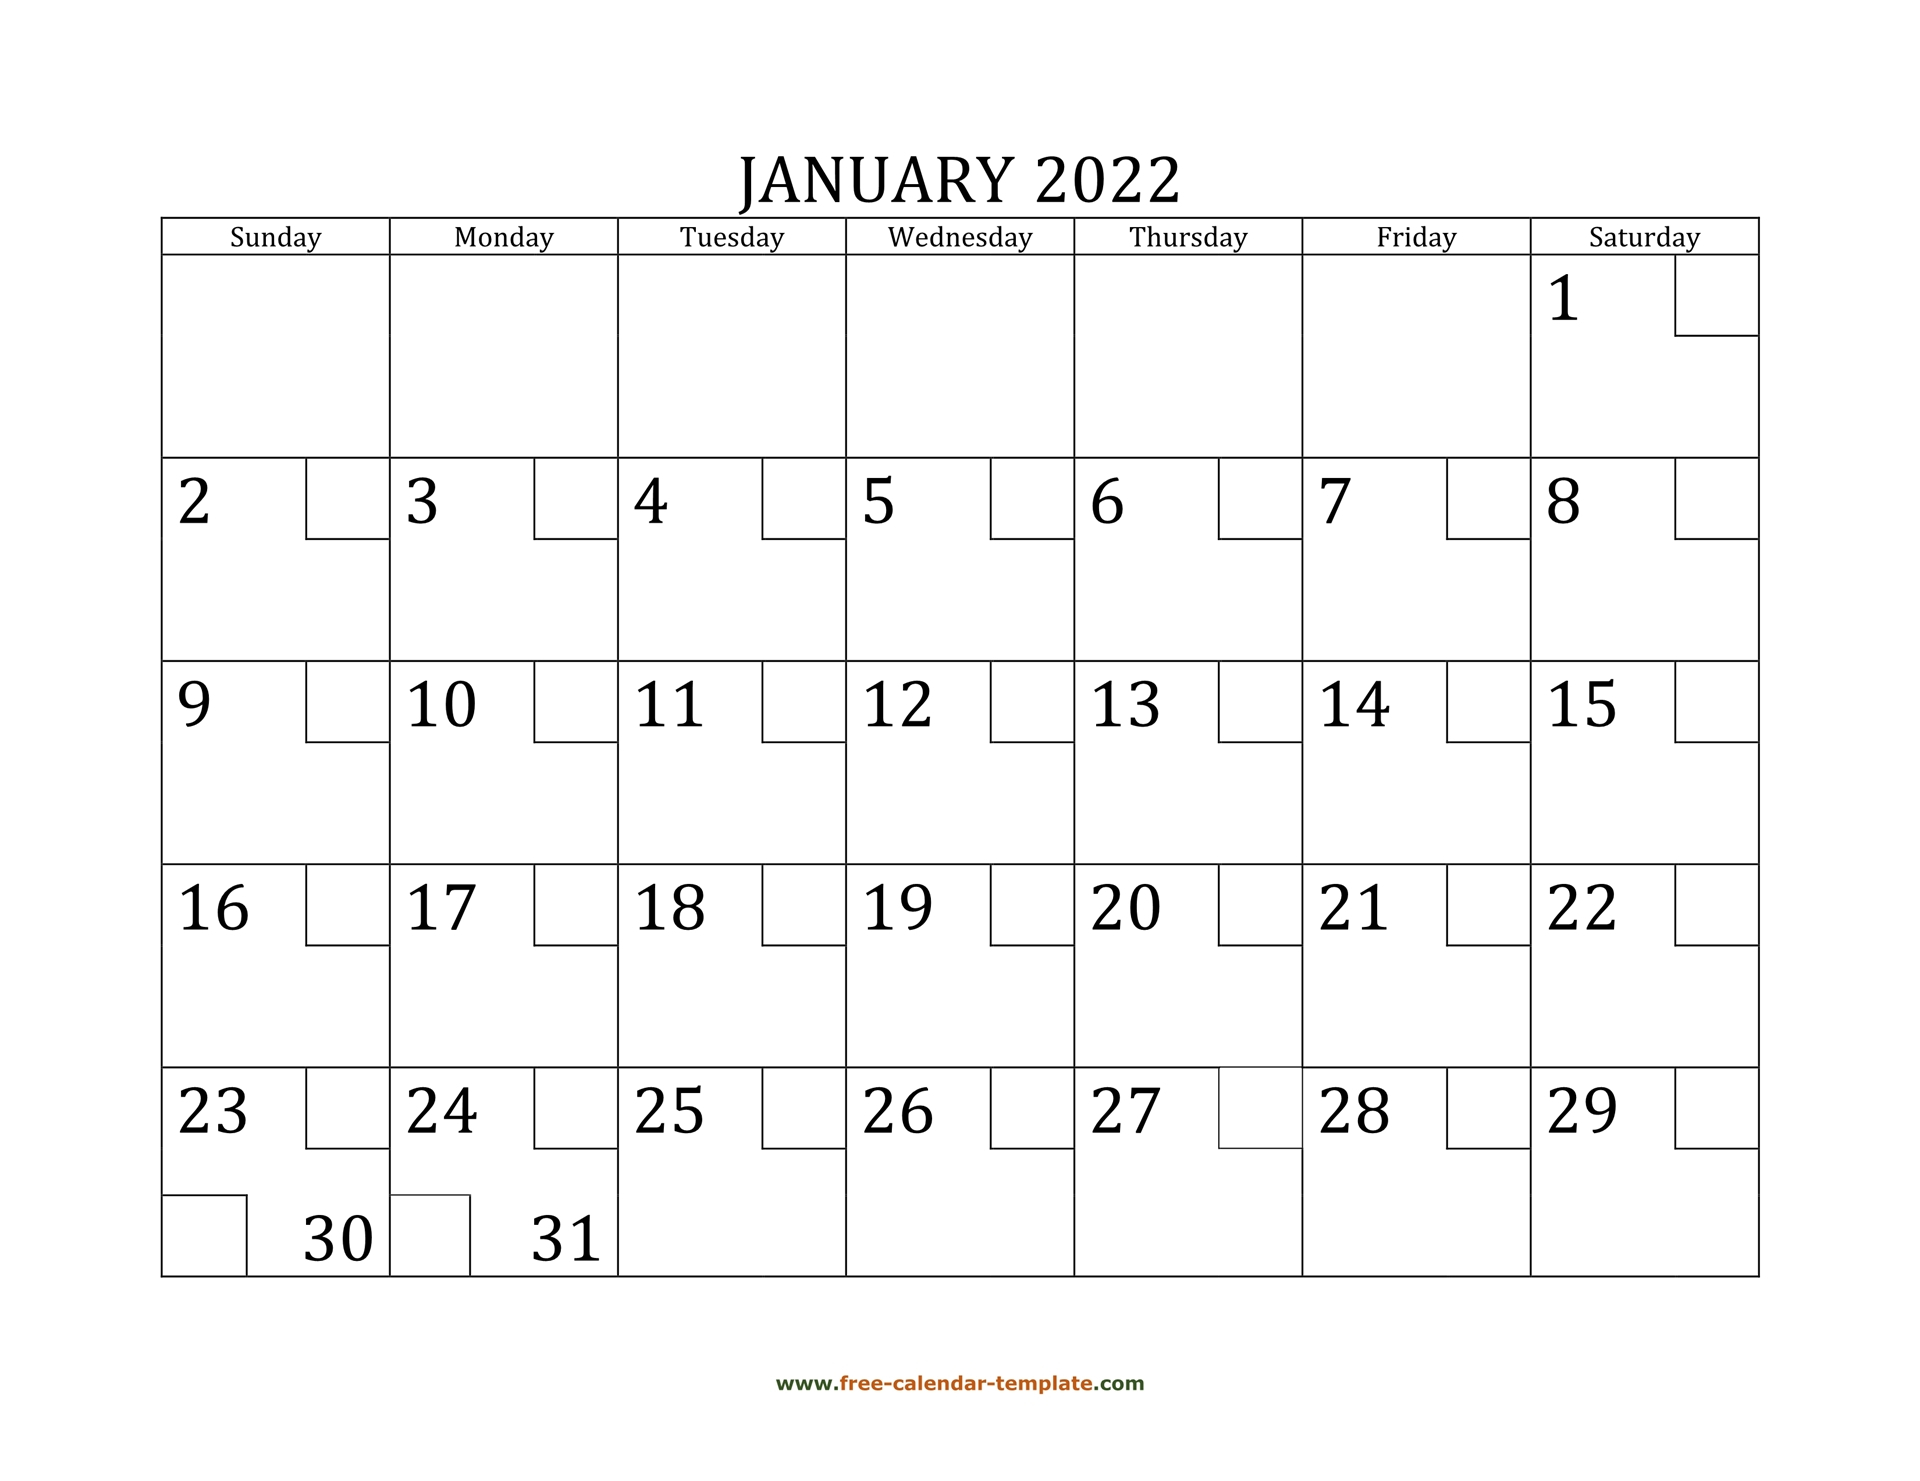 January 2022 Free Calendar Tempplate | Free Calendar For January 2022 Calendar Template